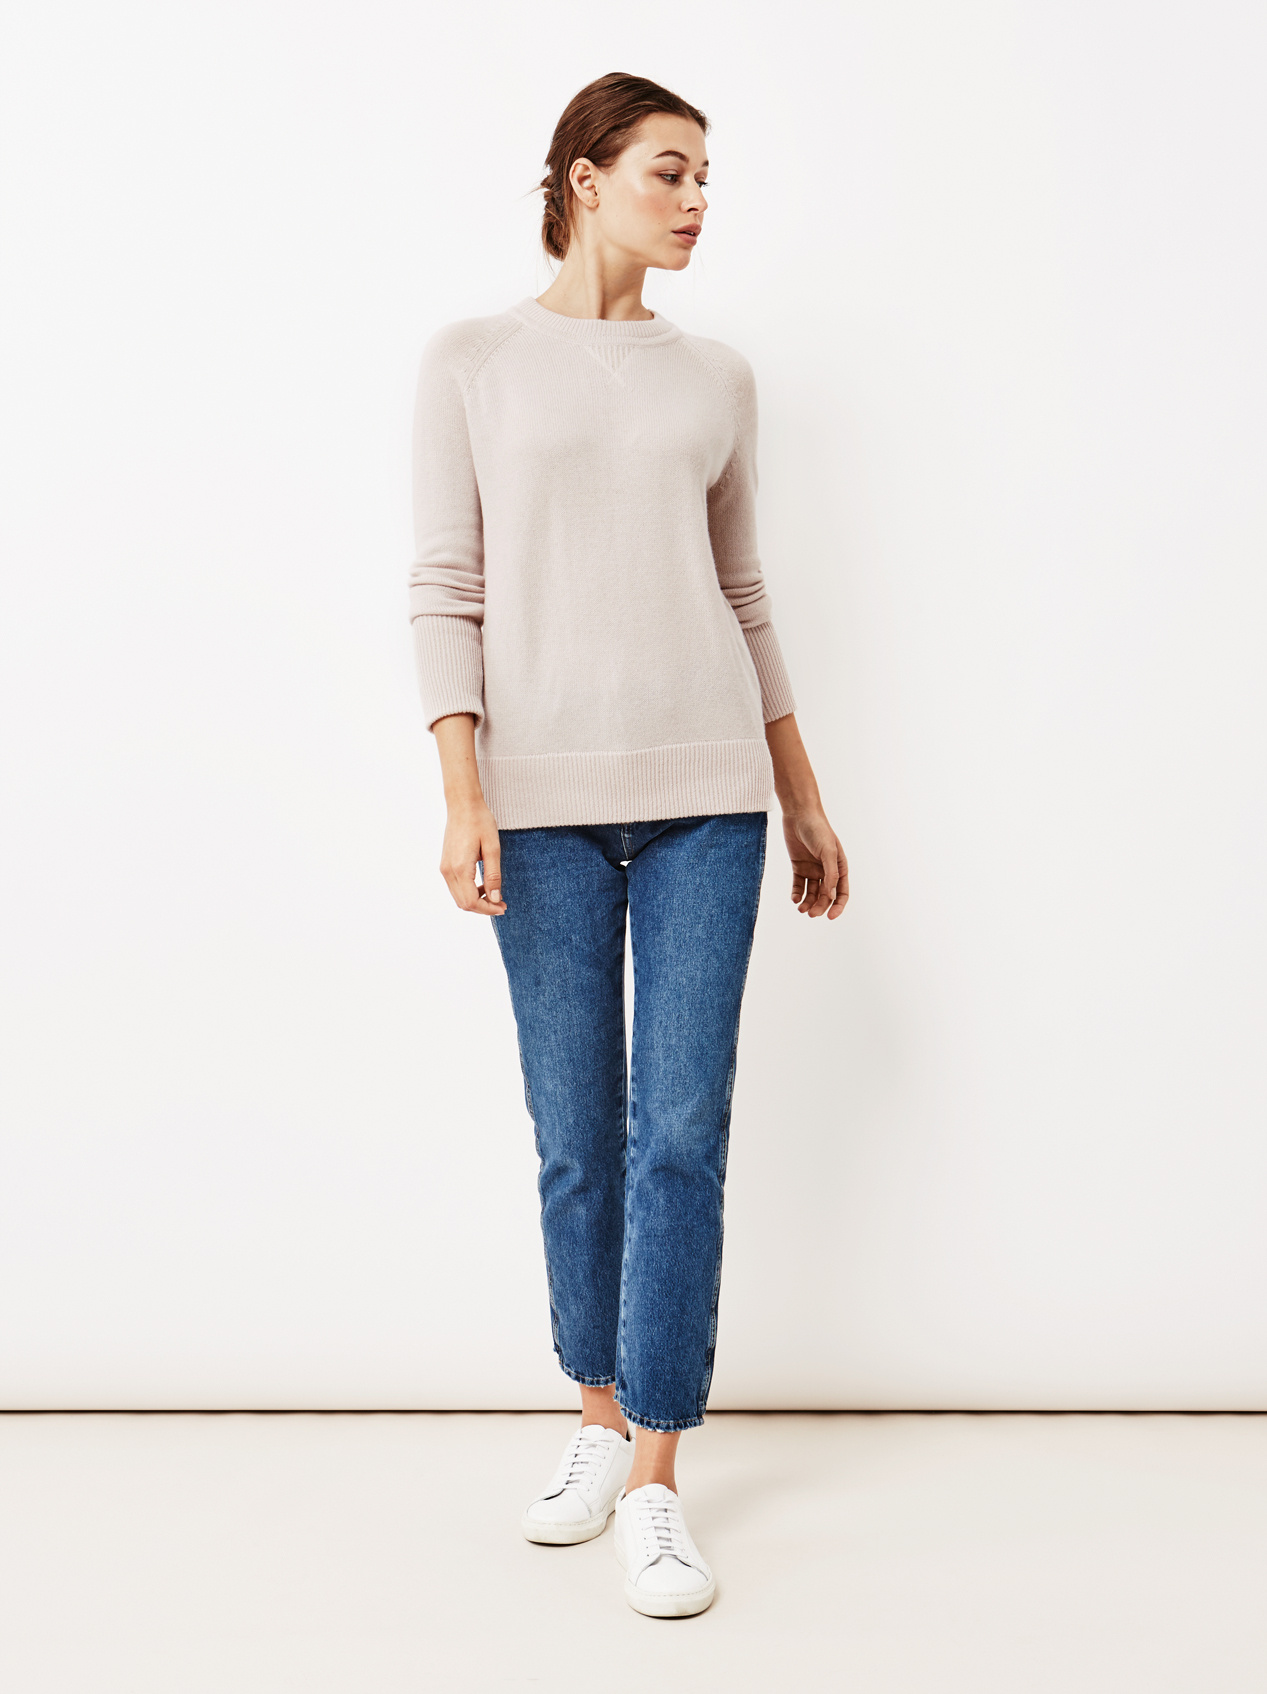 Soft Goat Women's College Sweater Marshmallow